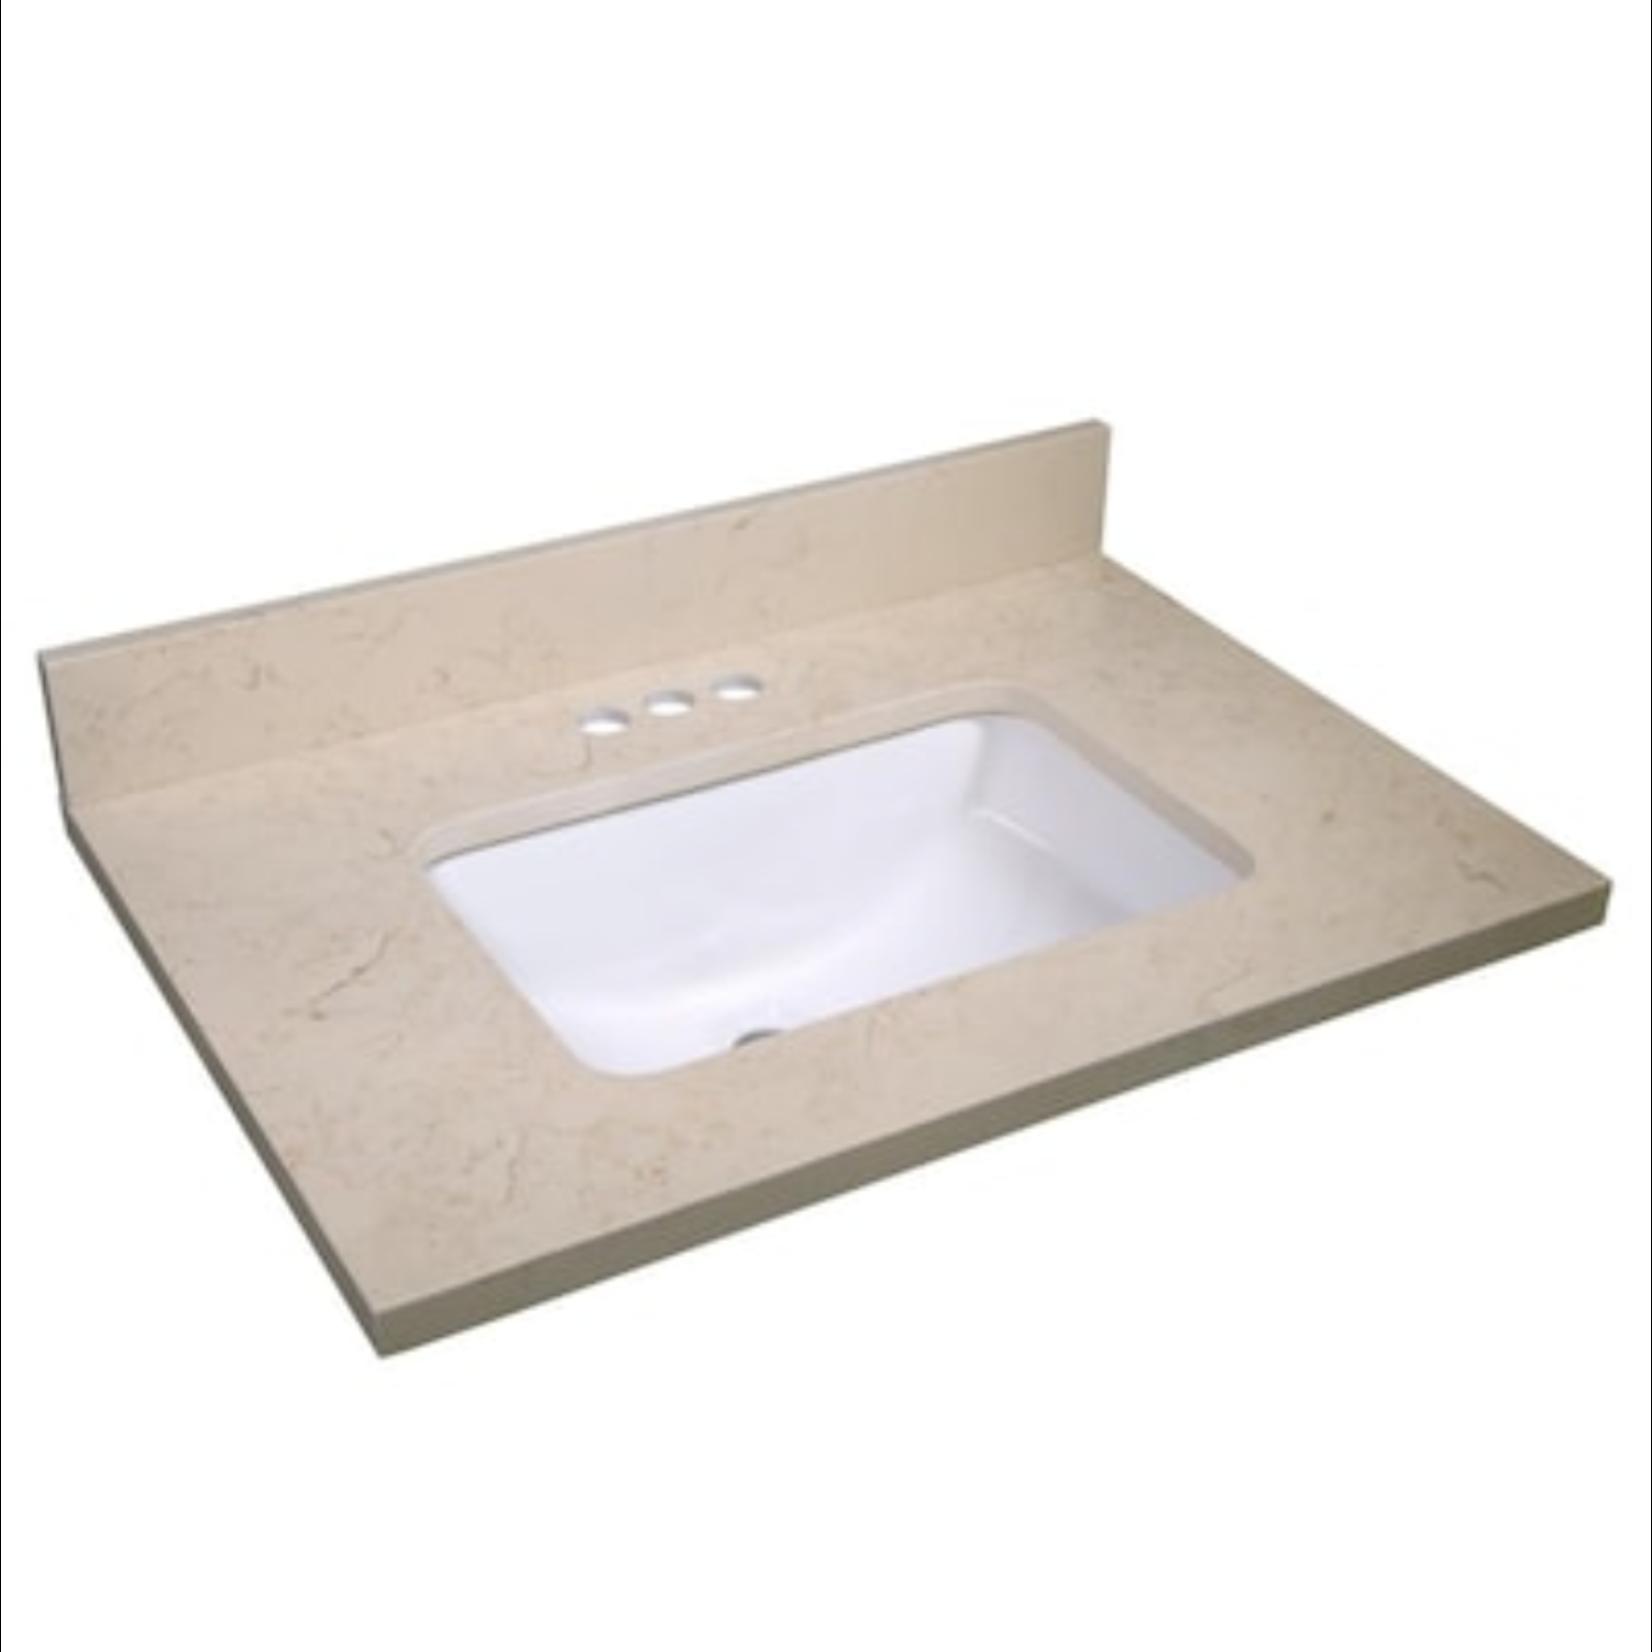 10297 Design House Giallo Single Sink Bathroom Vanity Top